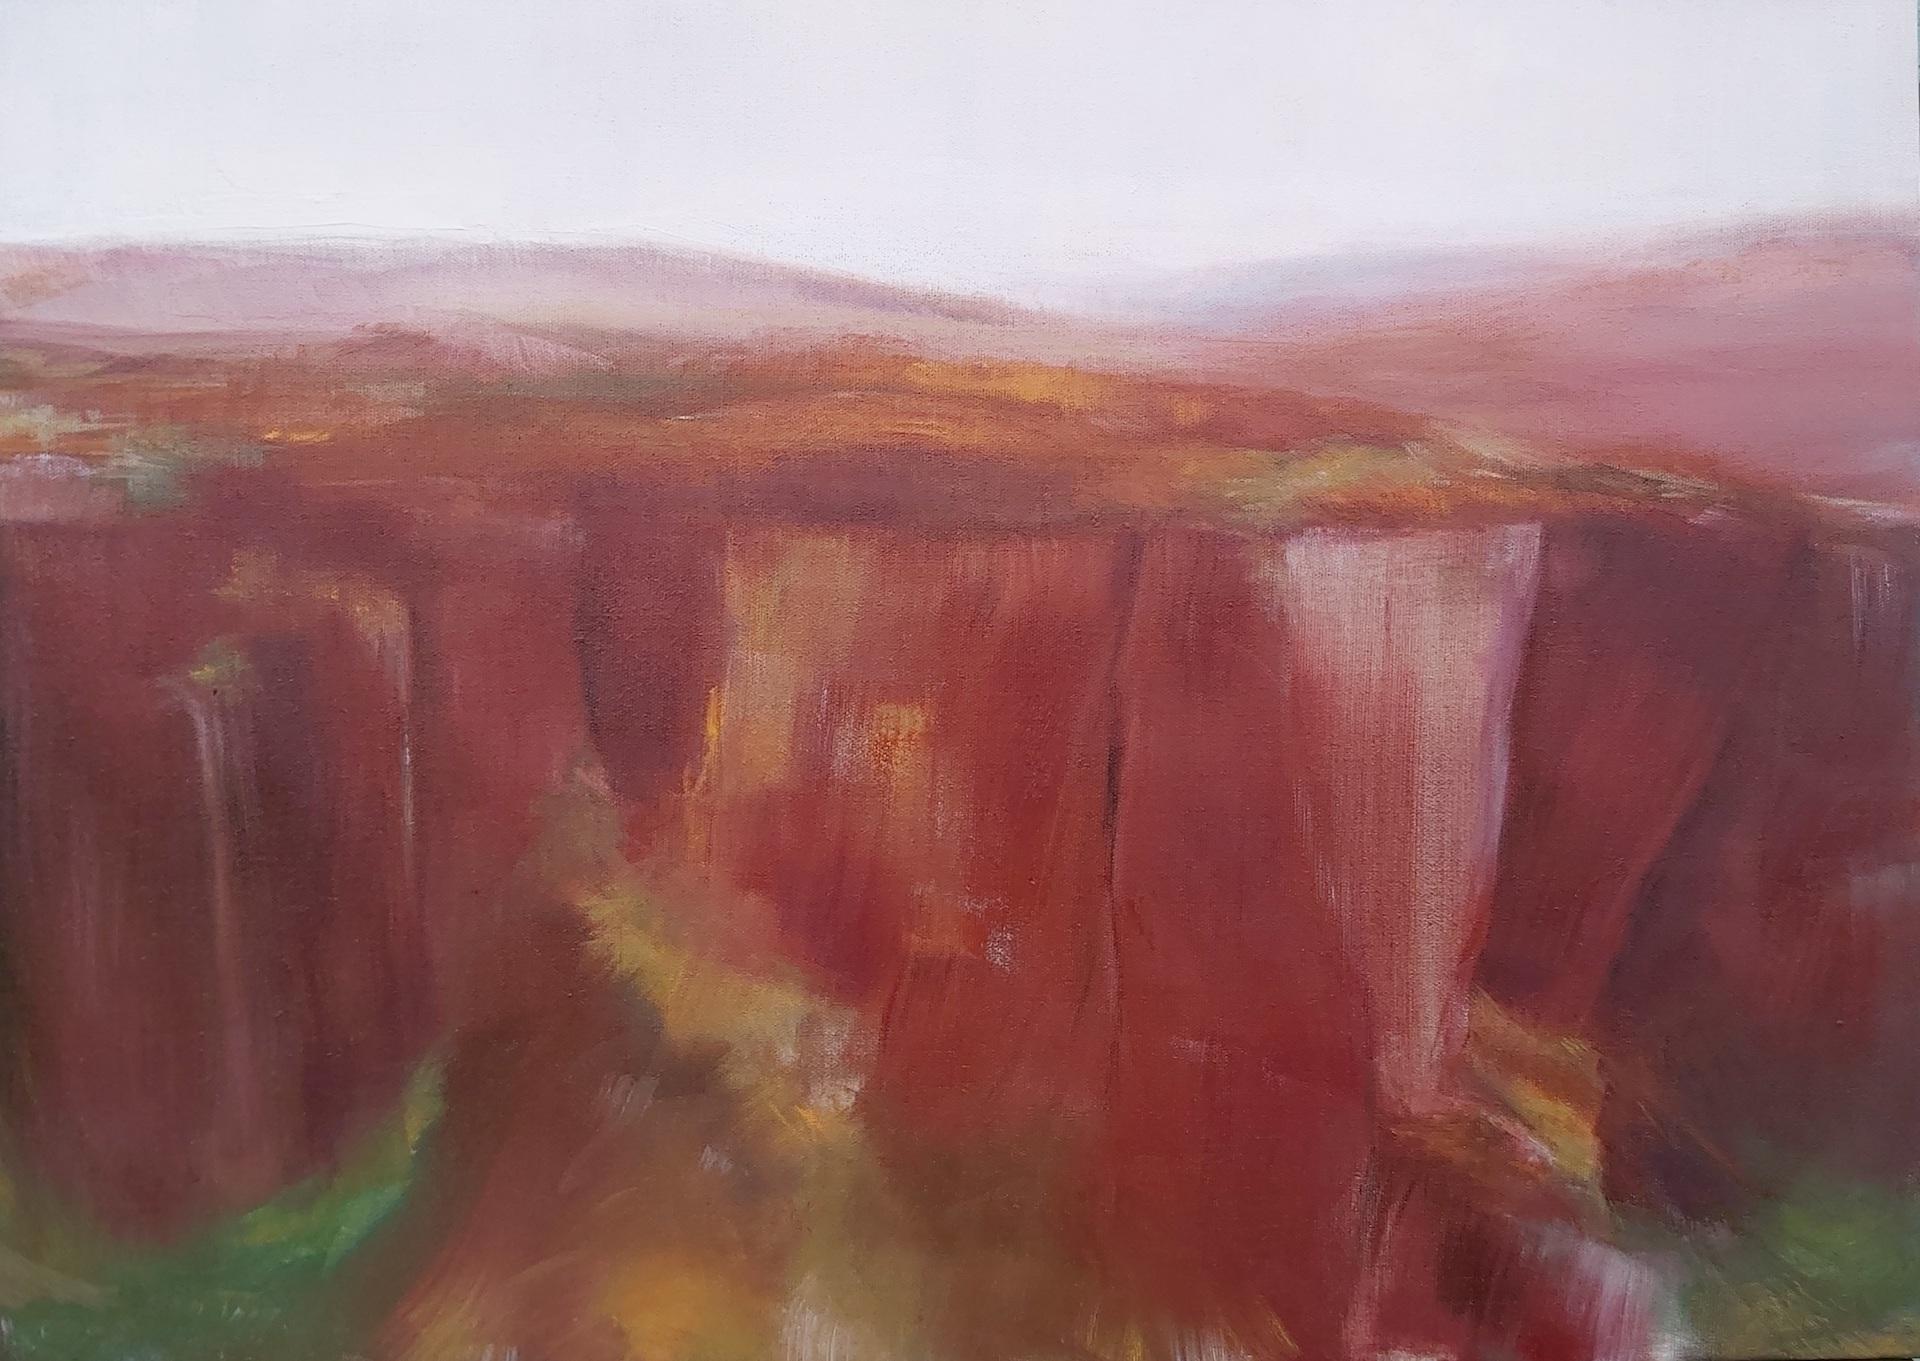 'Higger Tor' Oil on Linen. 50/70cm. 2020 Contemporary British Landscape Painting